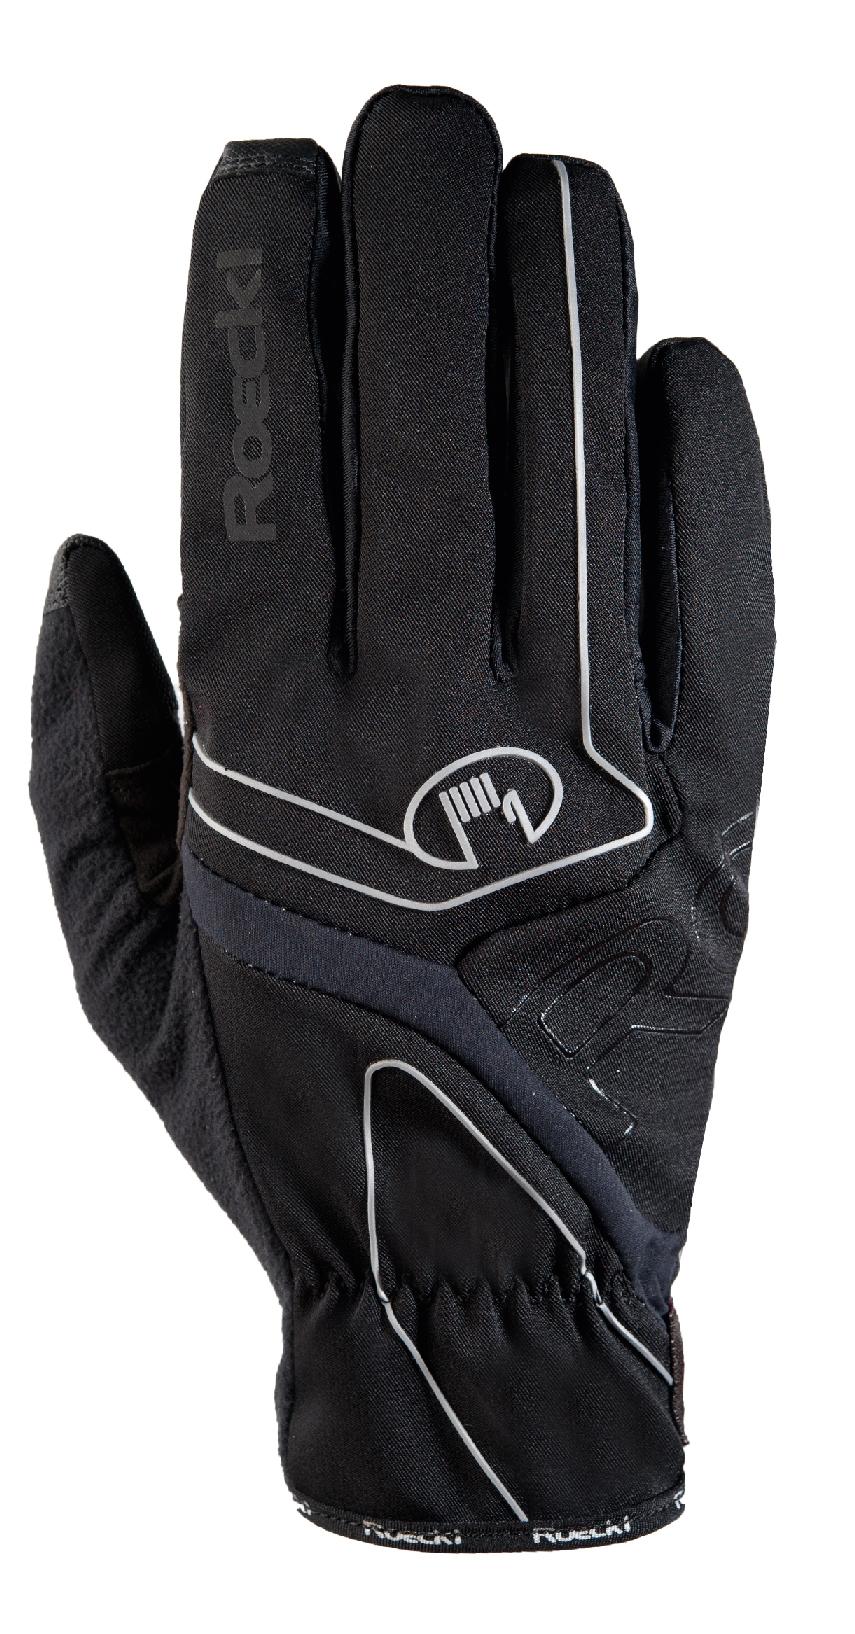 Unisex Langlauf Handschuhe